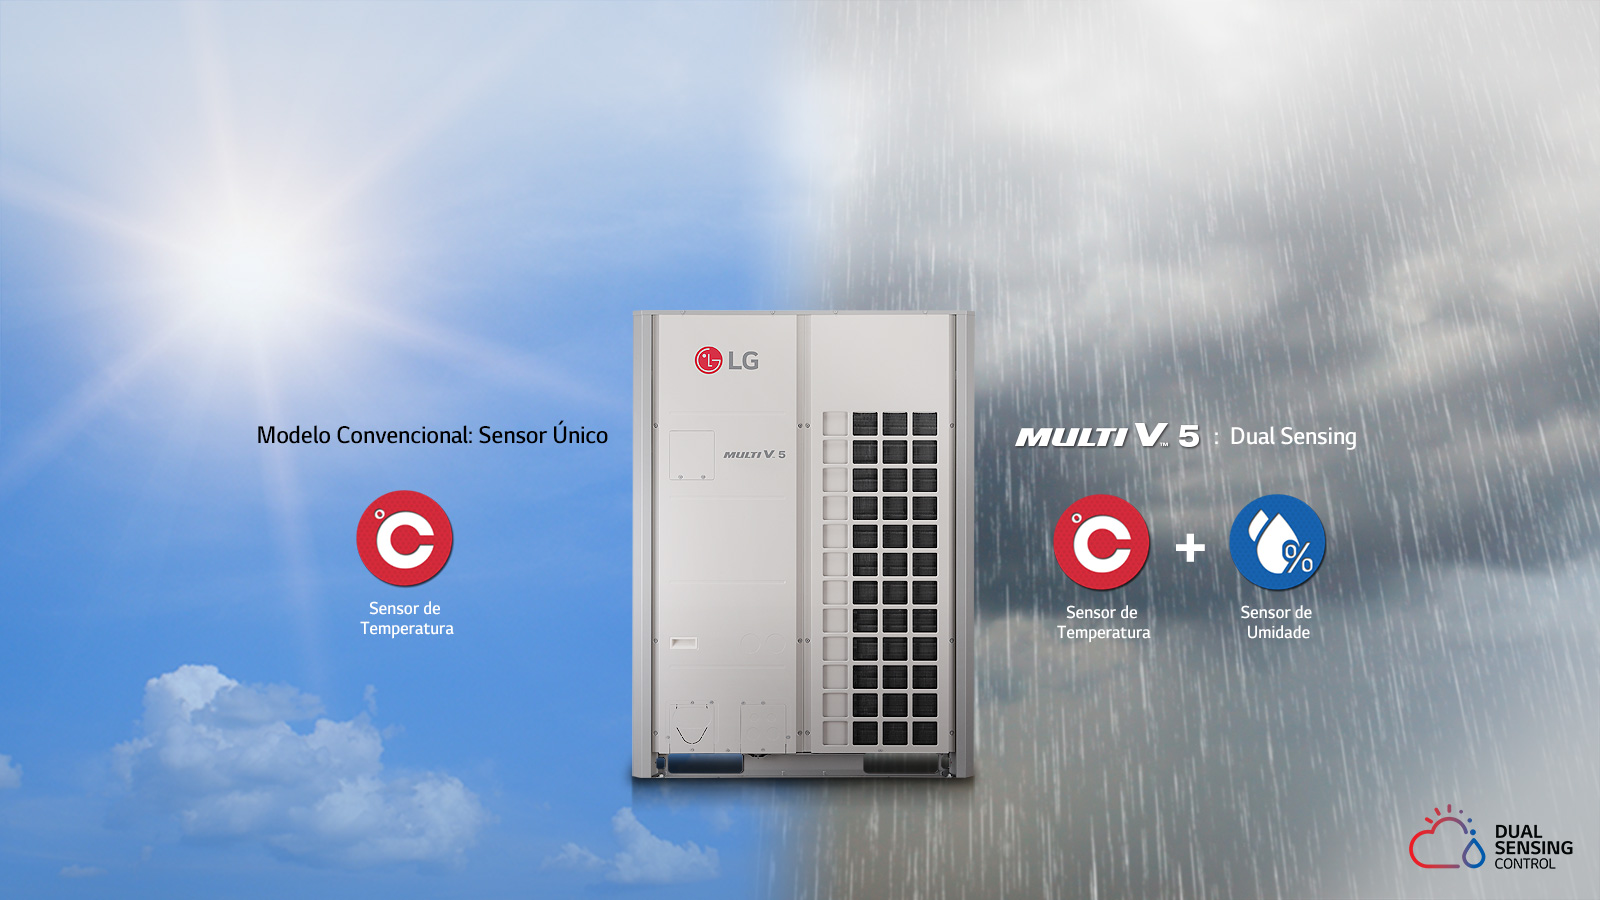 VRF Multi V 5 - Dual Sensing Control